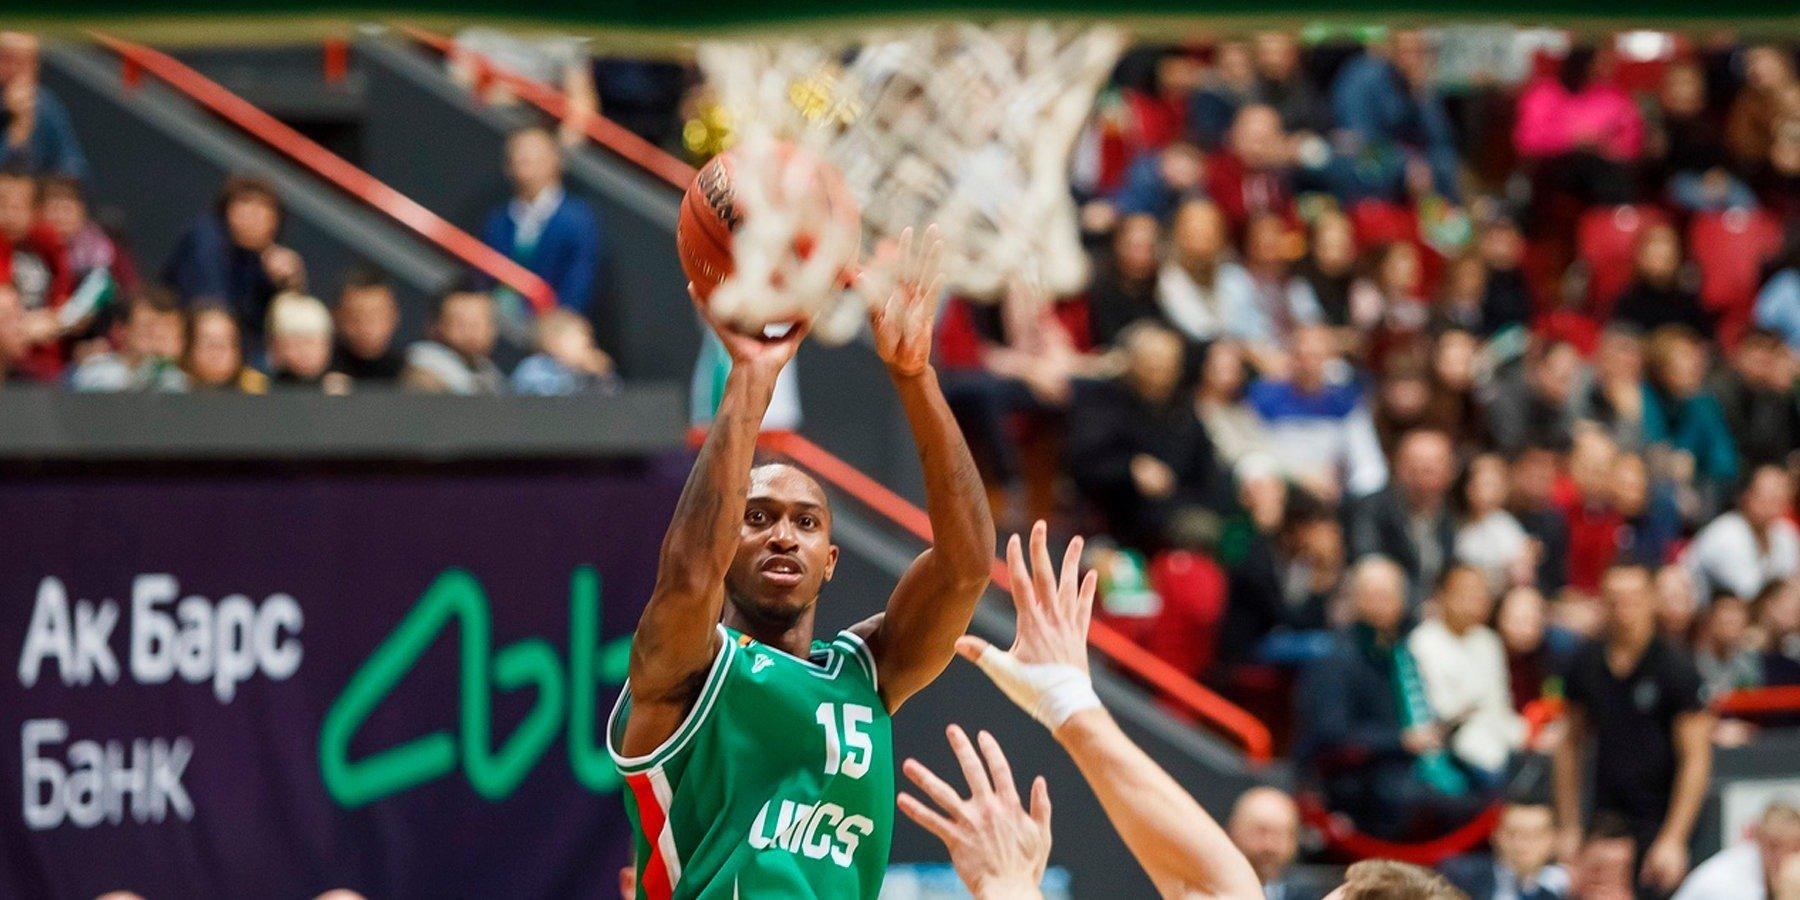 Erik Makkollum UNIKS Edinaya Liga VTB Basketbol